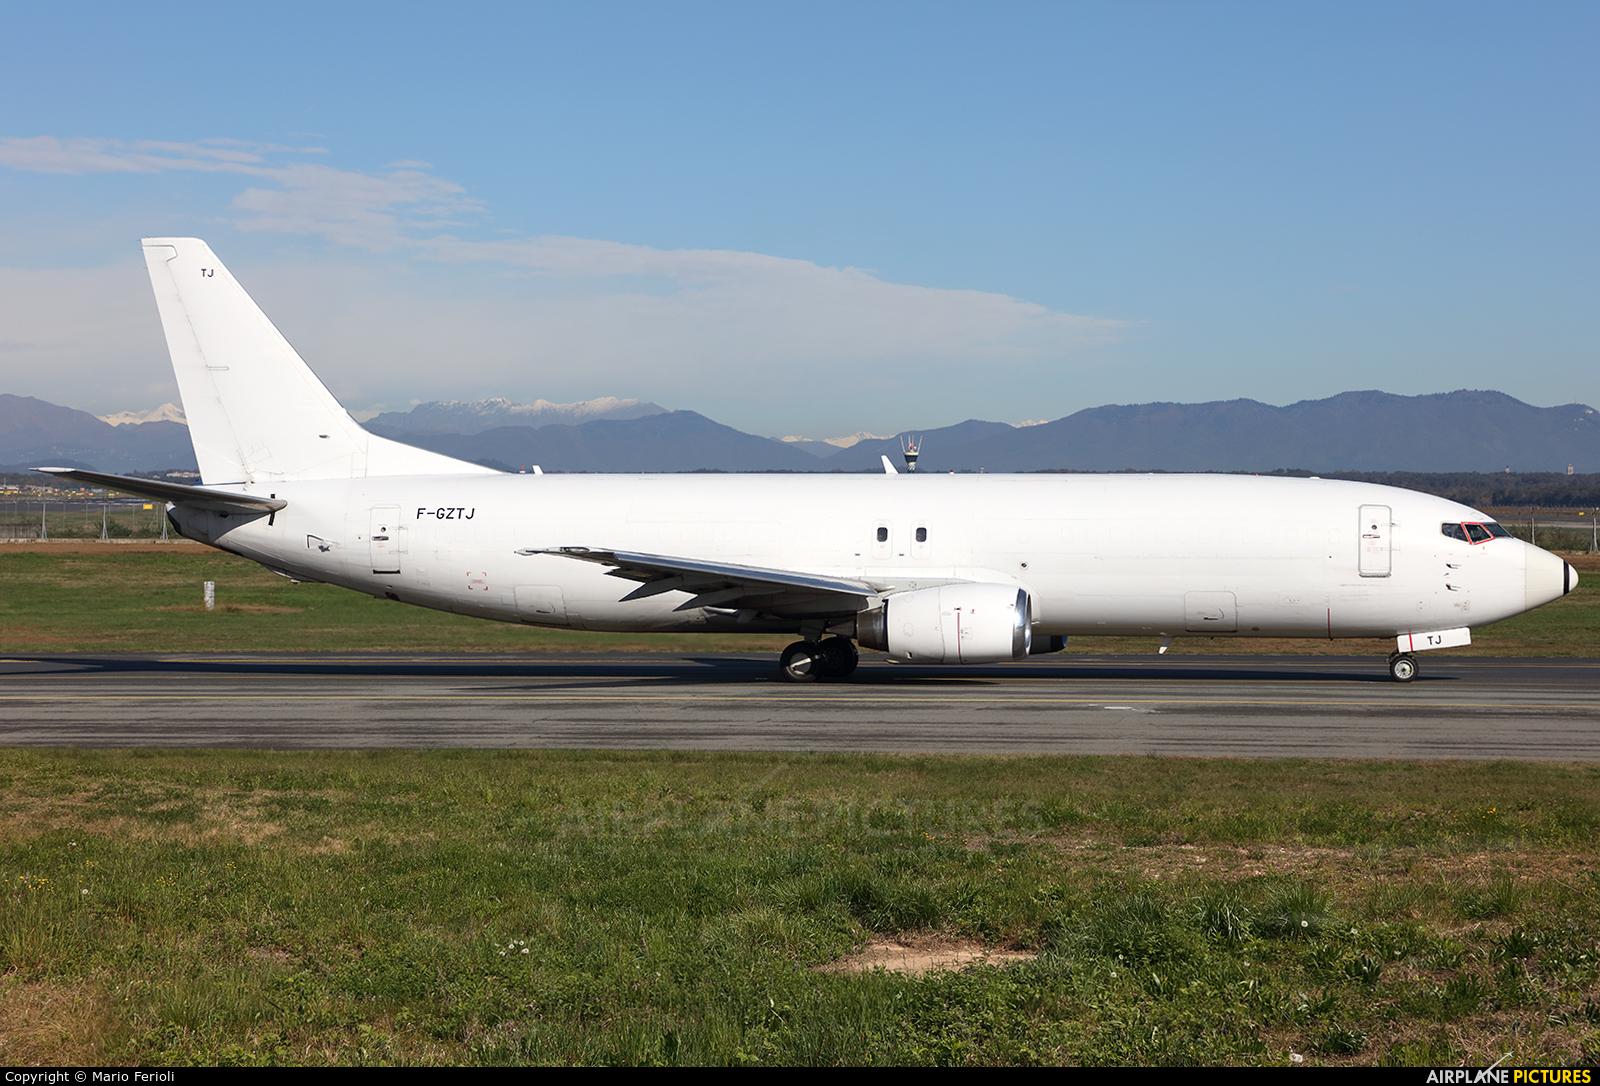 ASL Airlines F-GZTJ aircraft at Milan - Malpensa